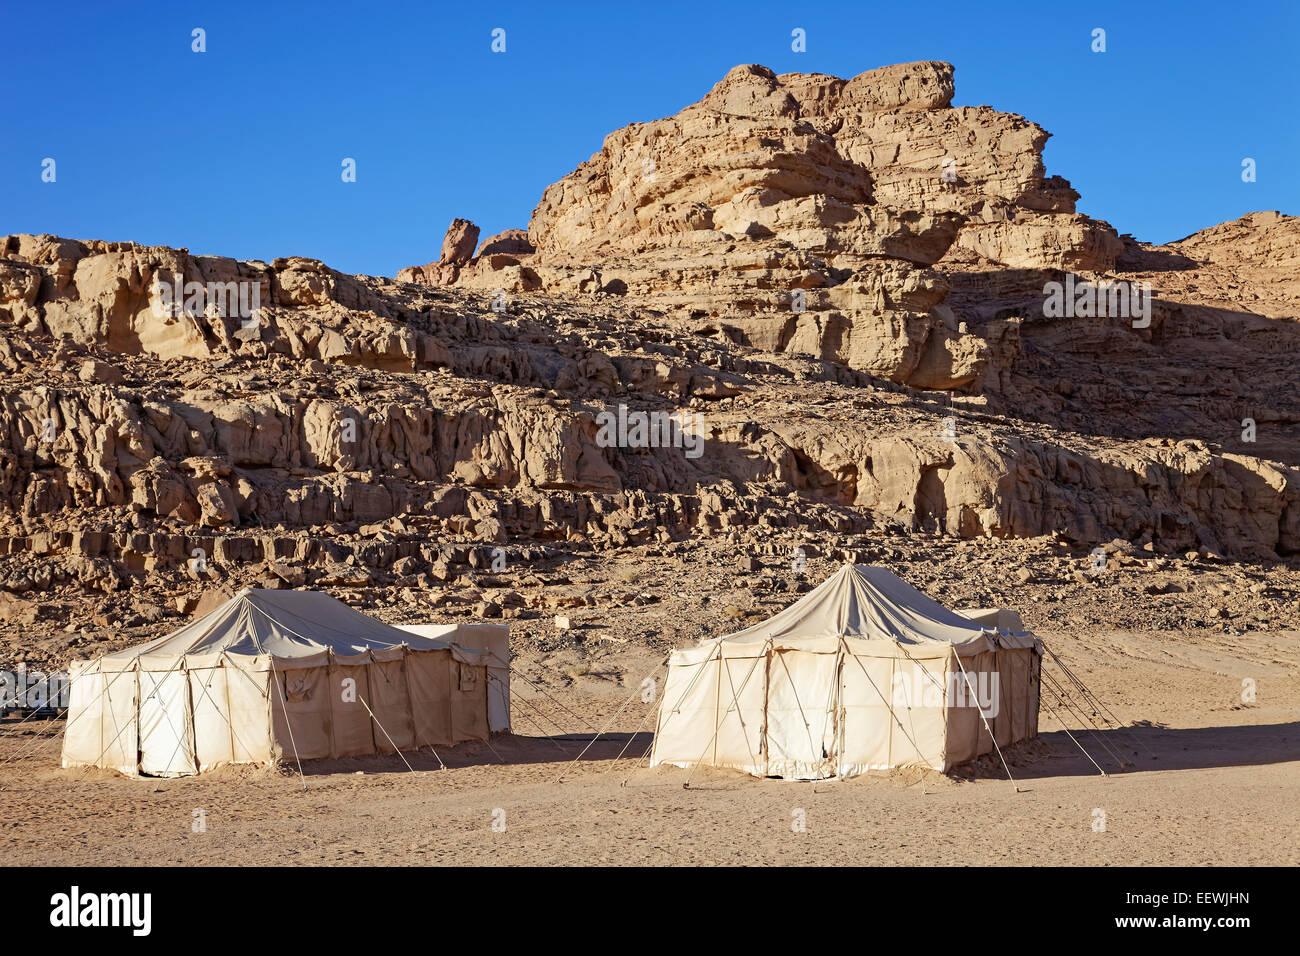 Tents, camp for tourists, rocks, Wadi Rum, Jordan - Stock Image